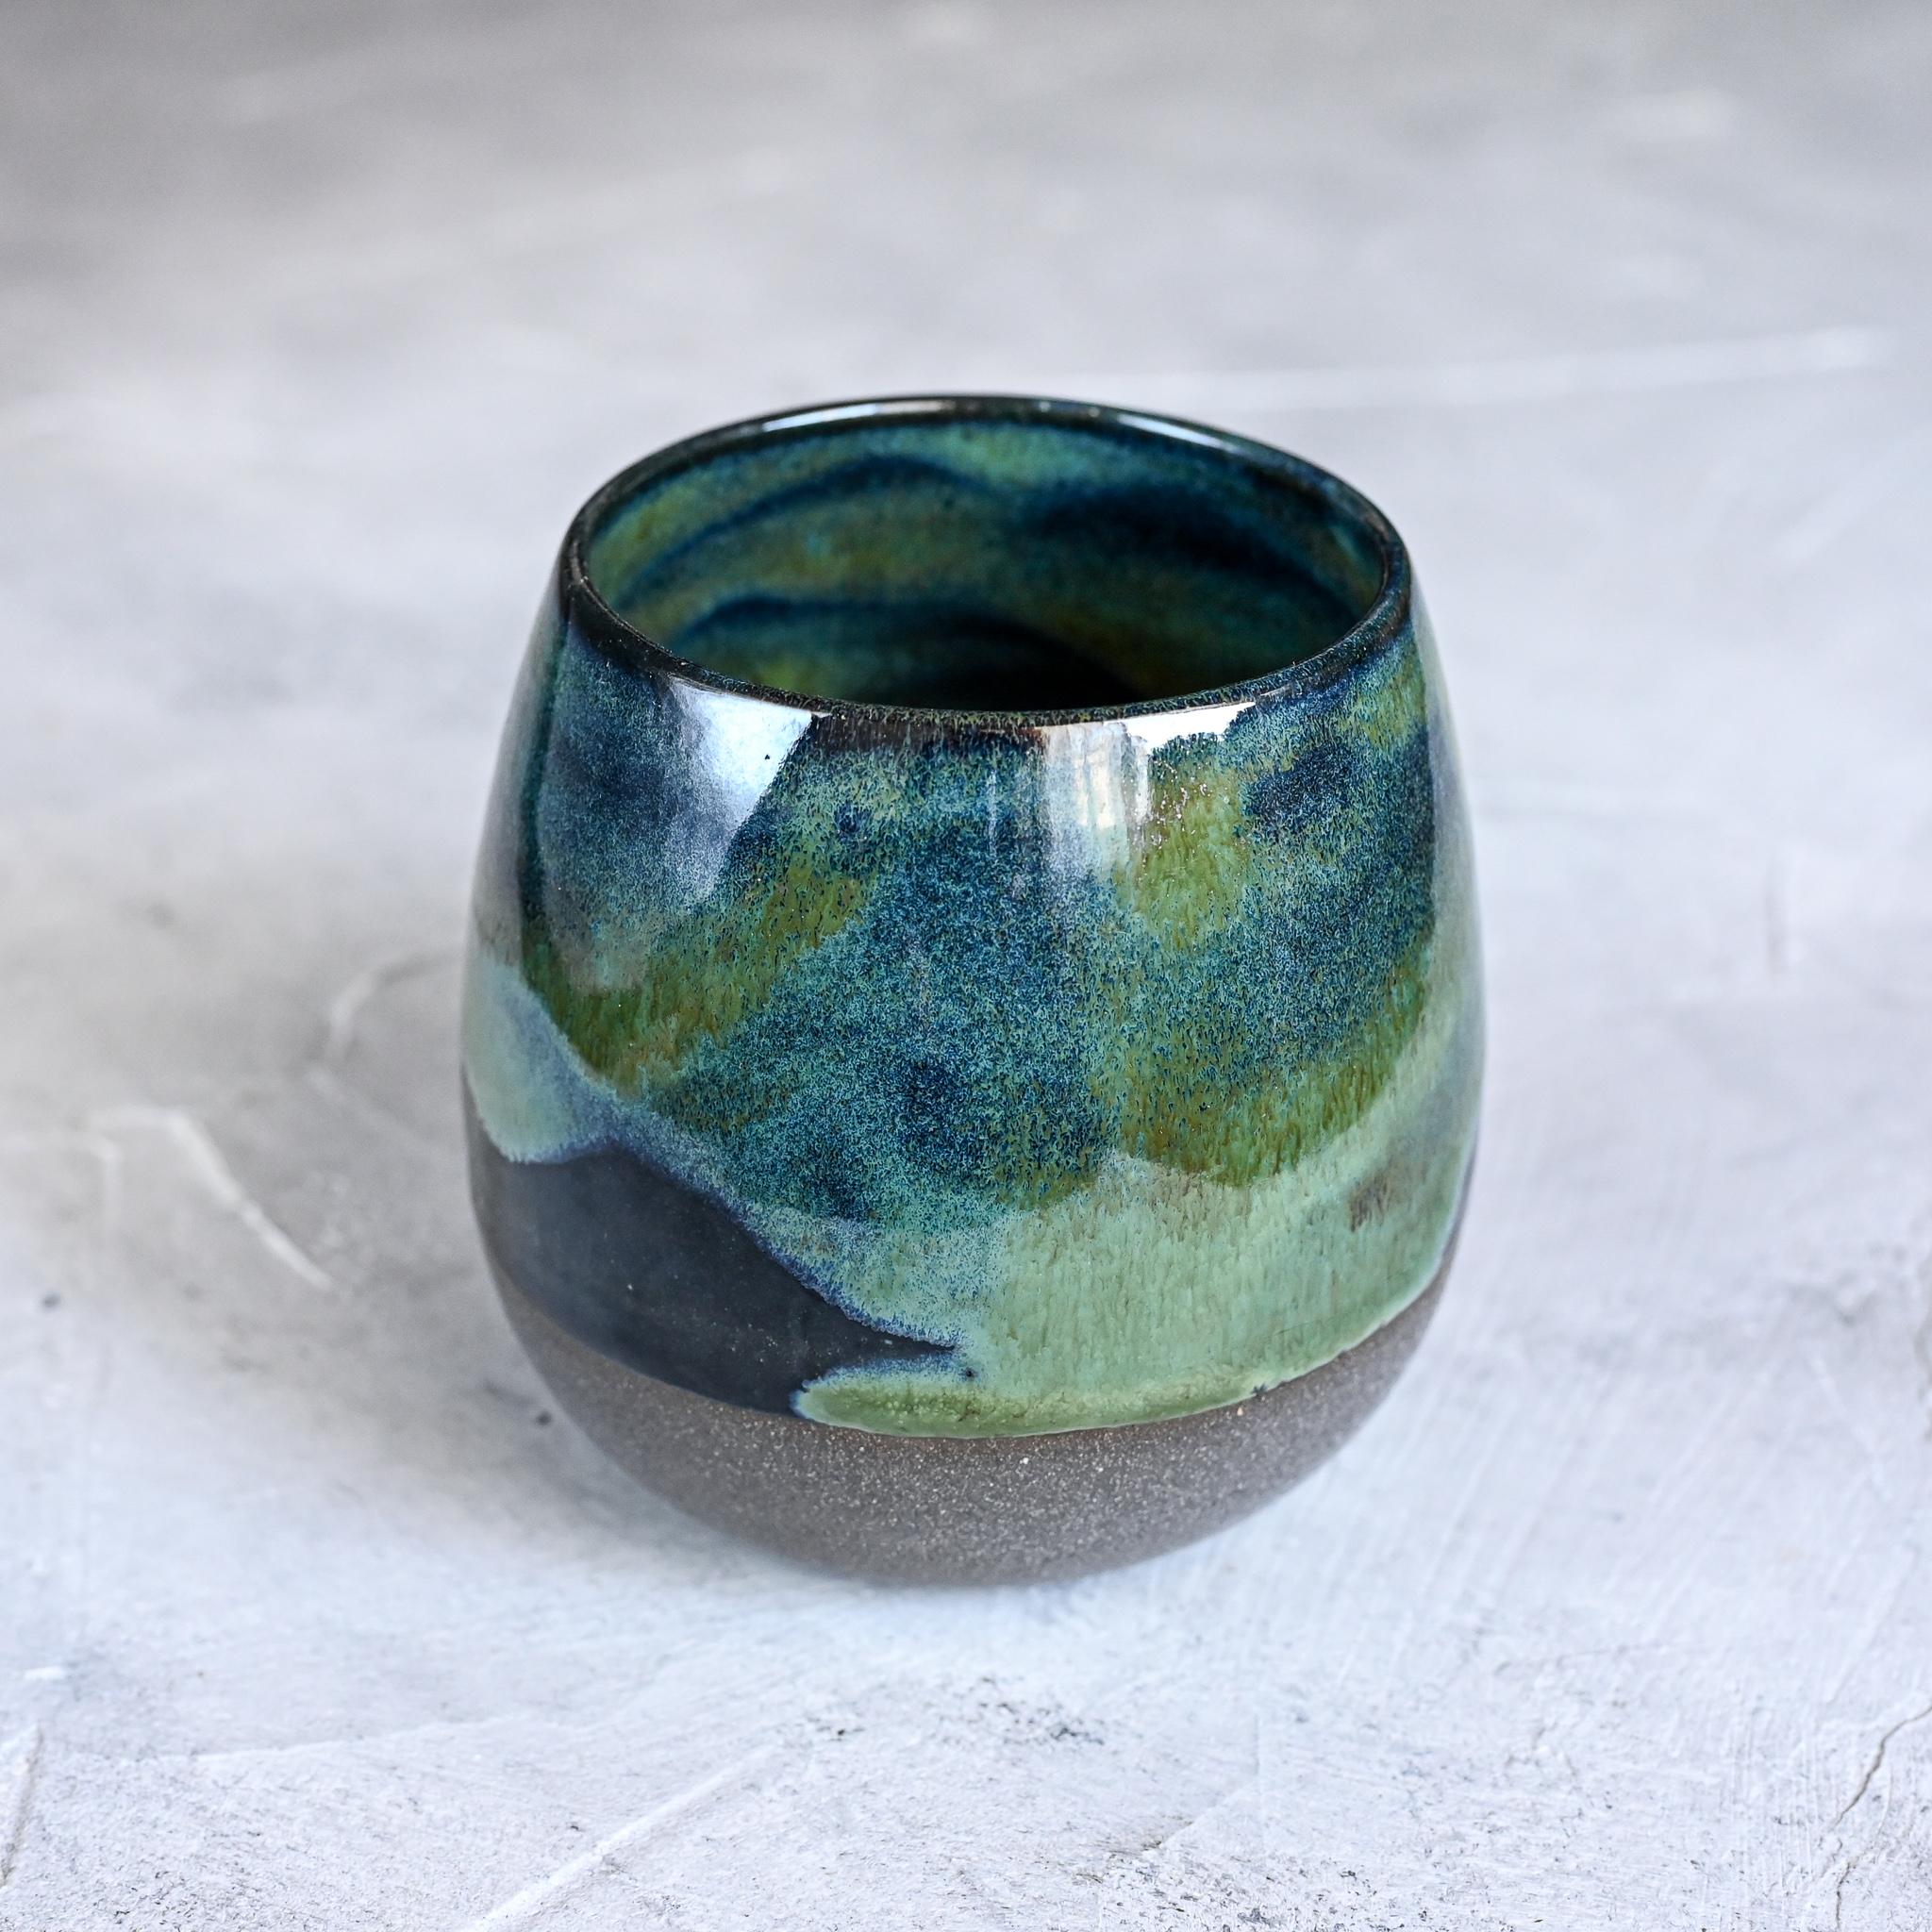 картинка Керамический стакан Марии Левиной 27 - DishWishes.Ru